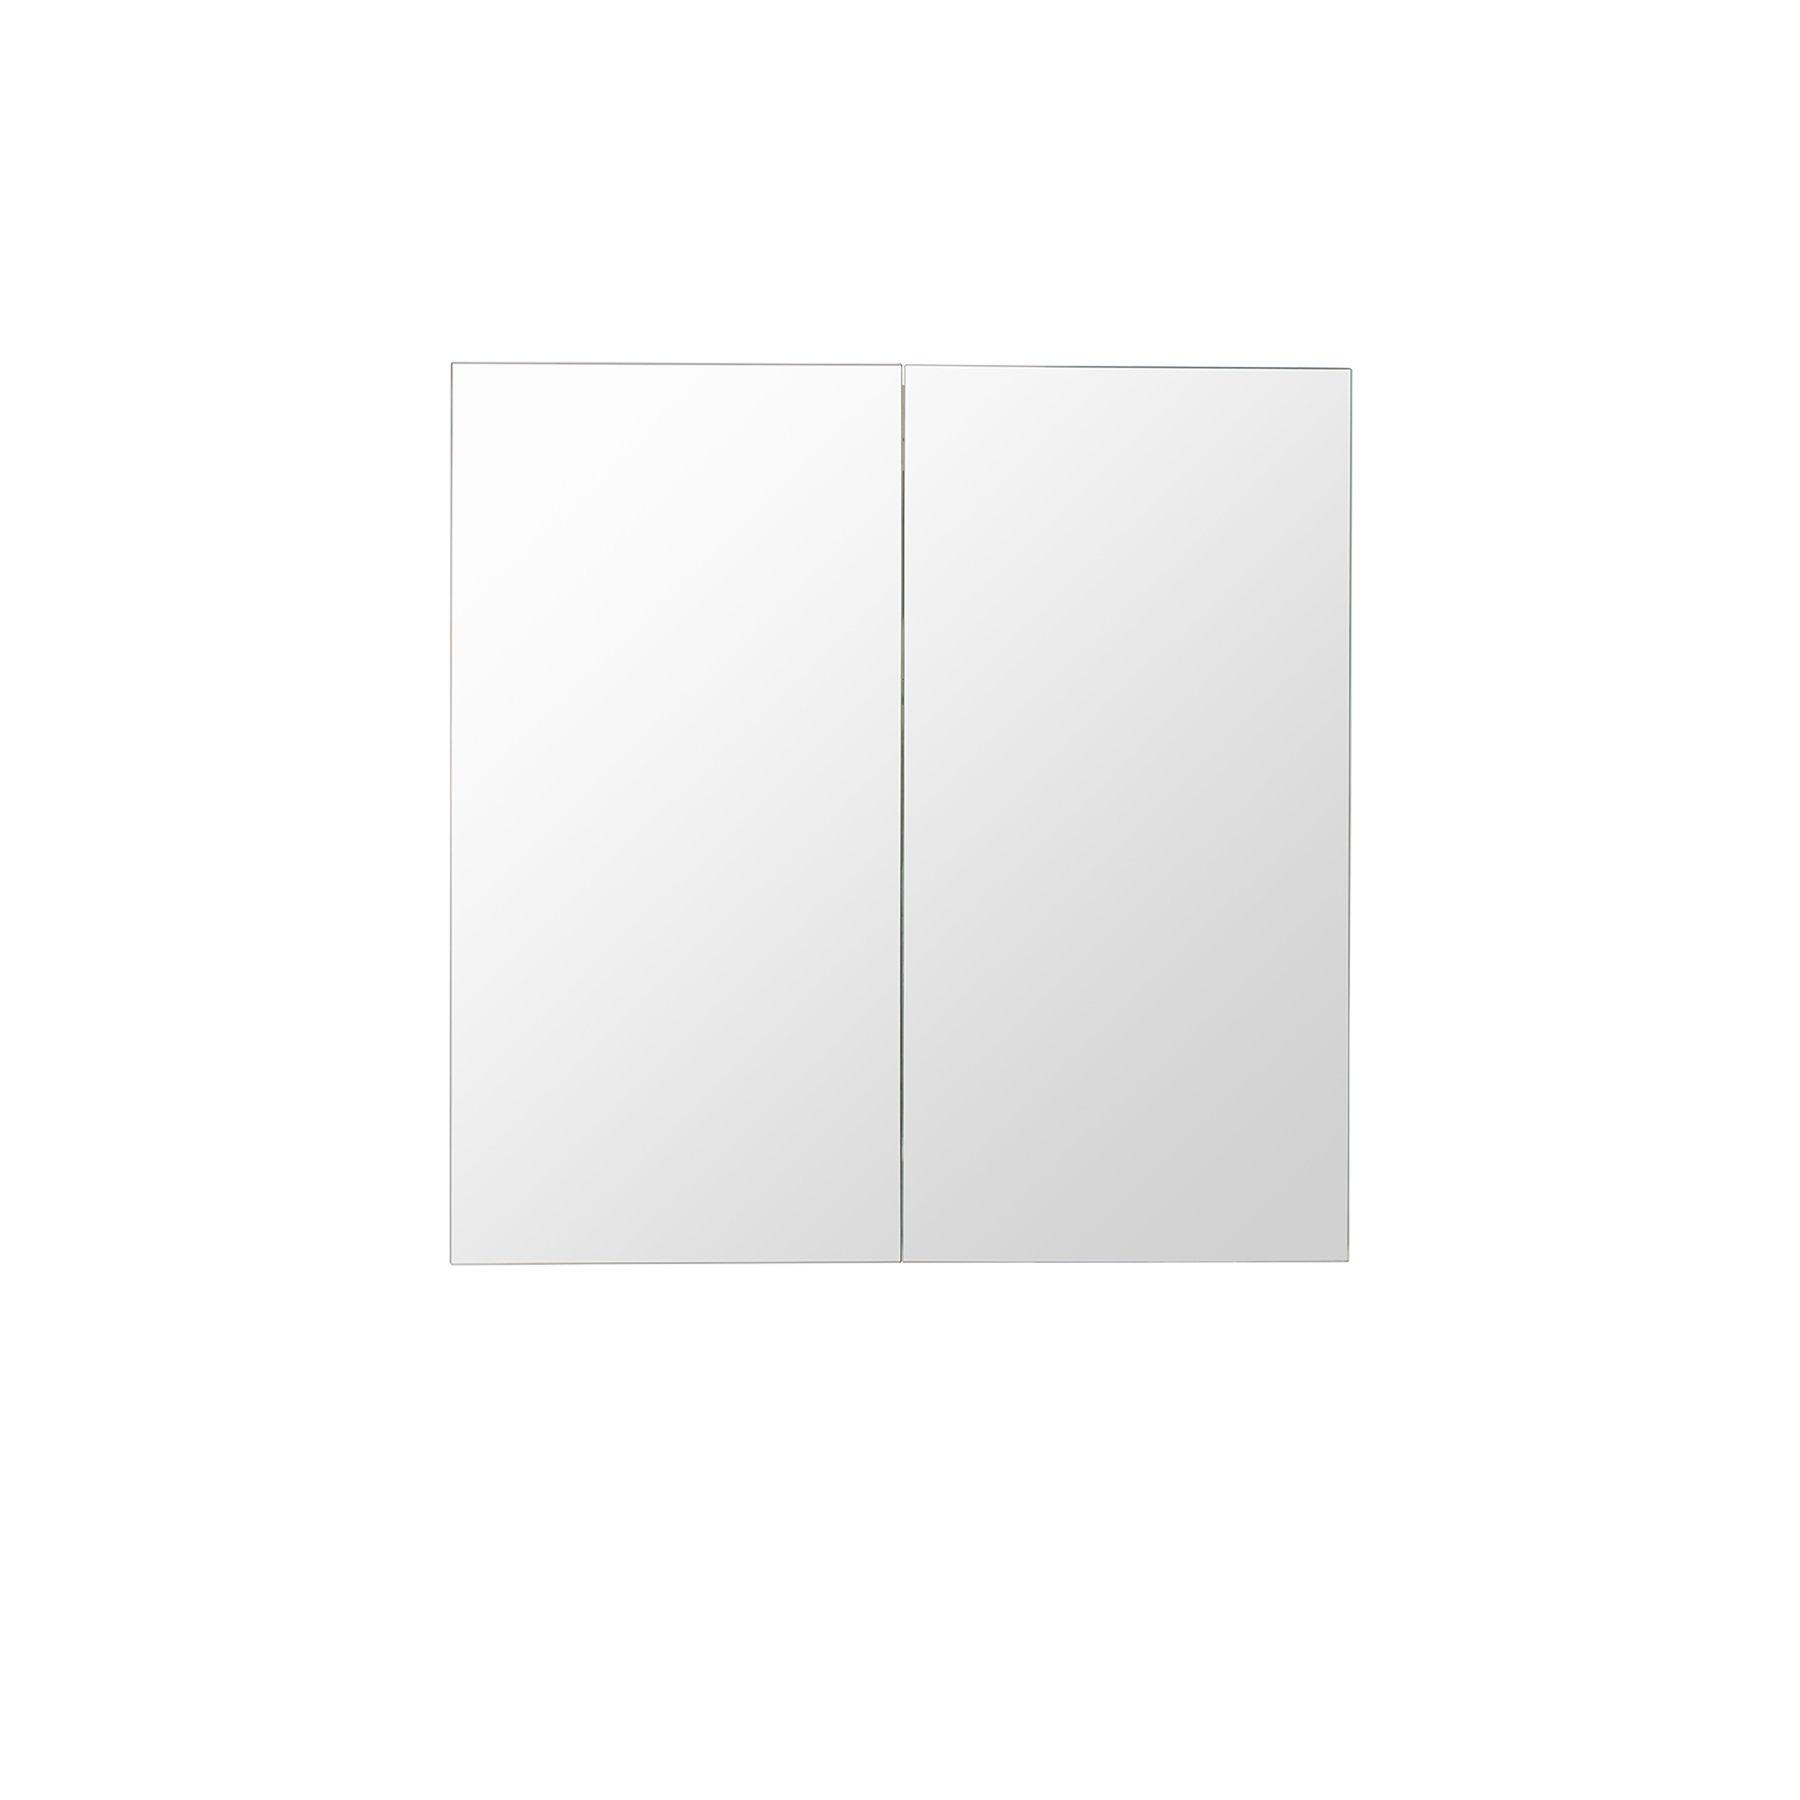 MAYKKE 24'' Heritage Double Mirror Medicine Cabinet with Sliding Doors   Wall Mounted Bathroom Storage   Stainless Steel, DJA1080101